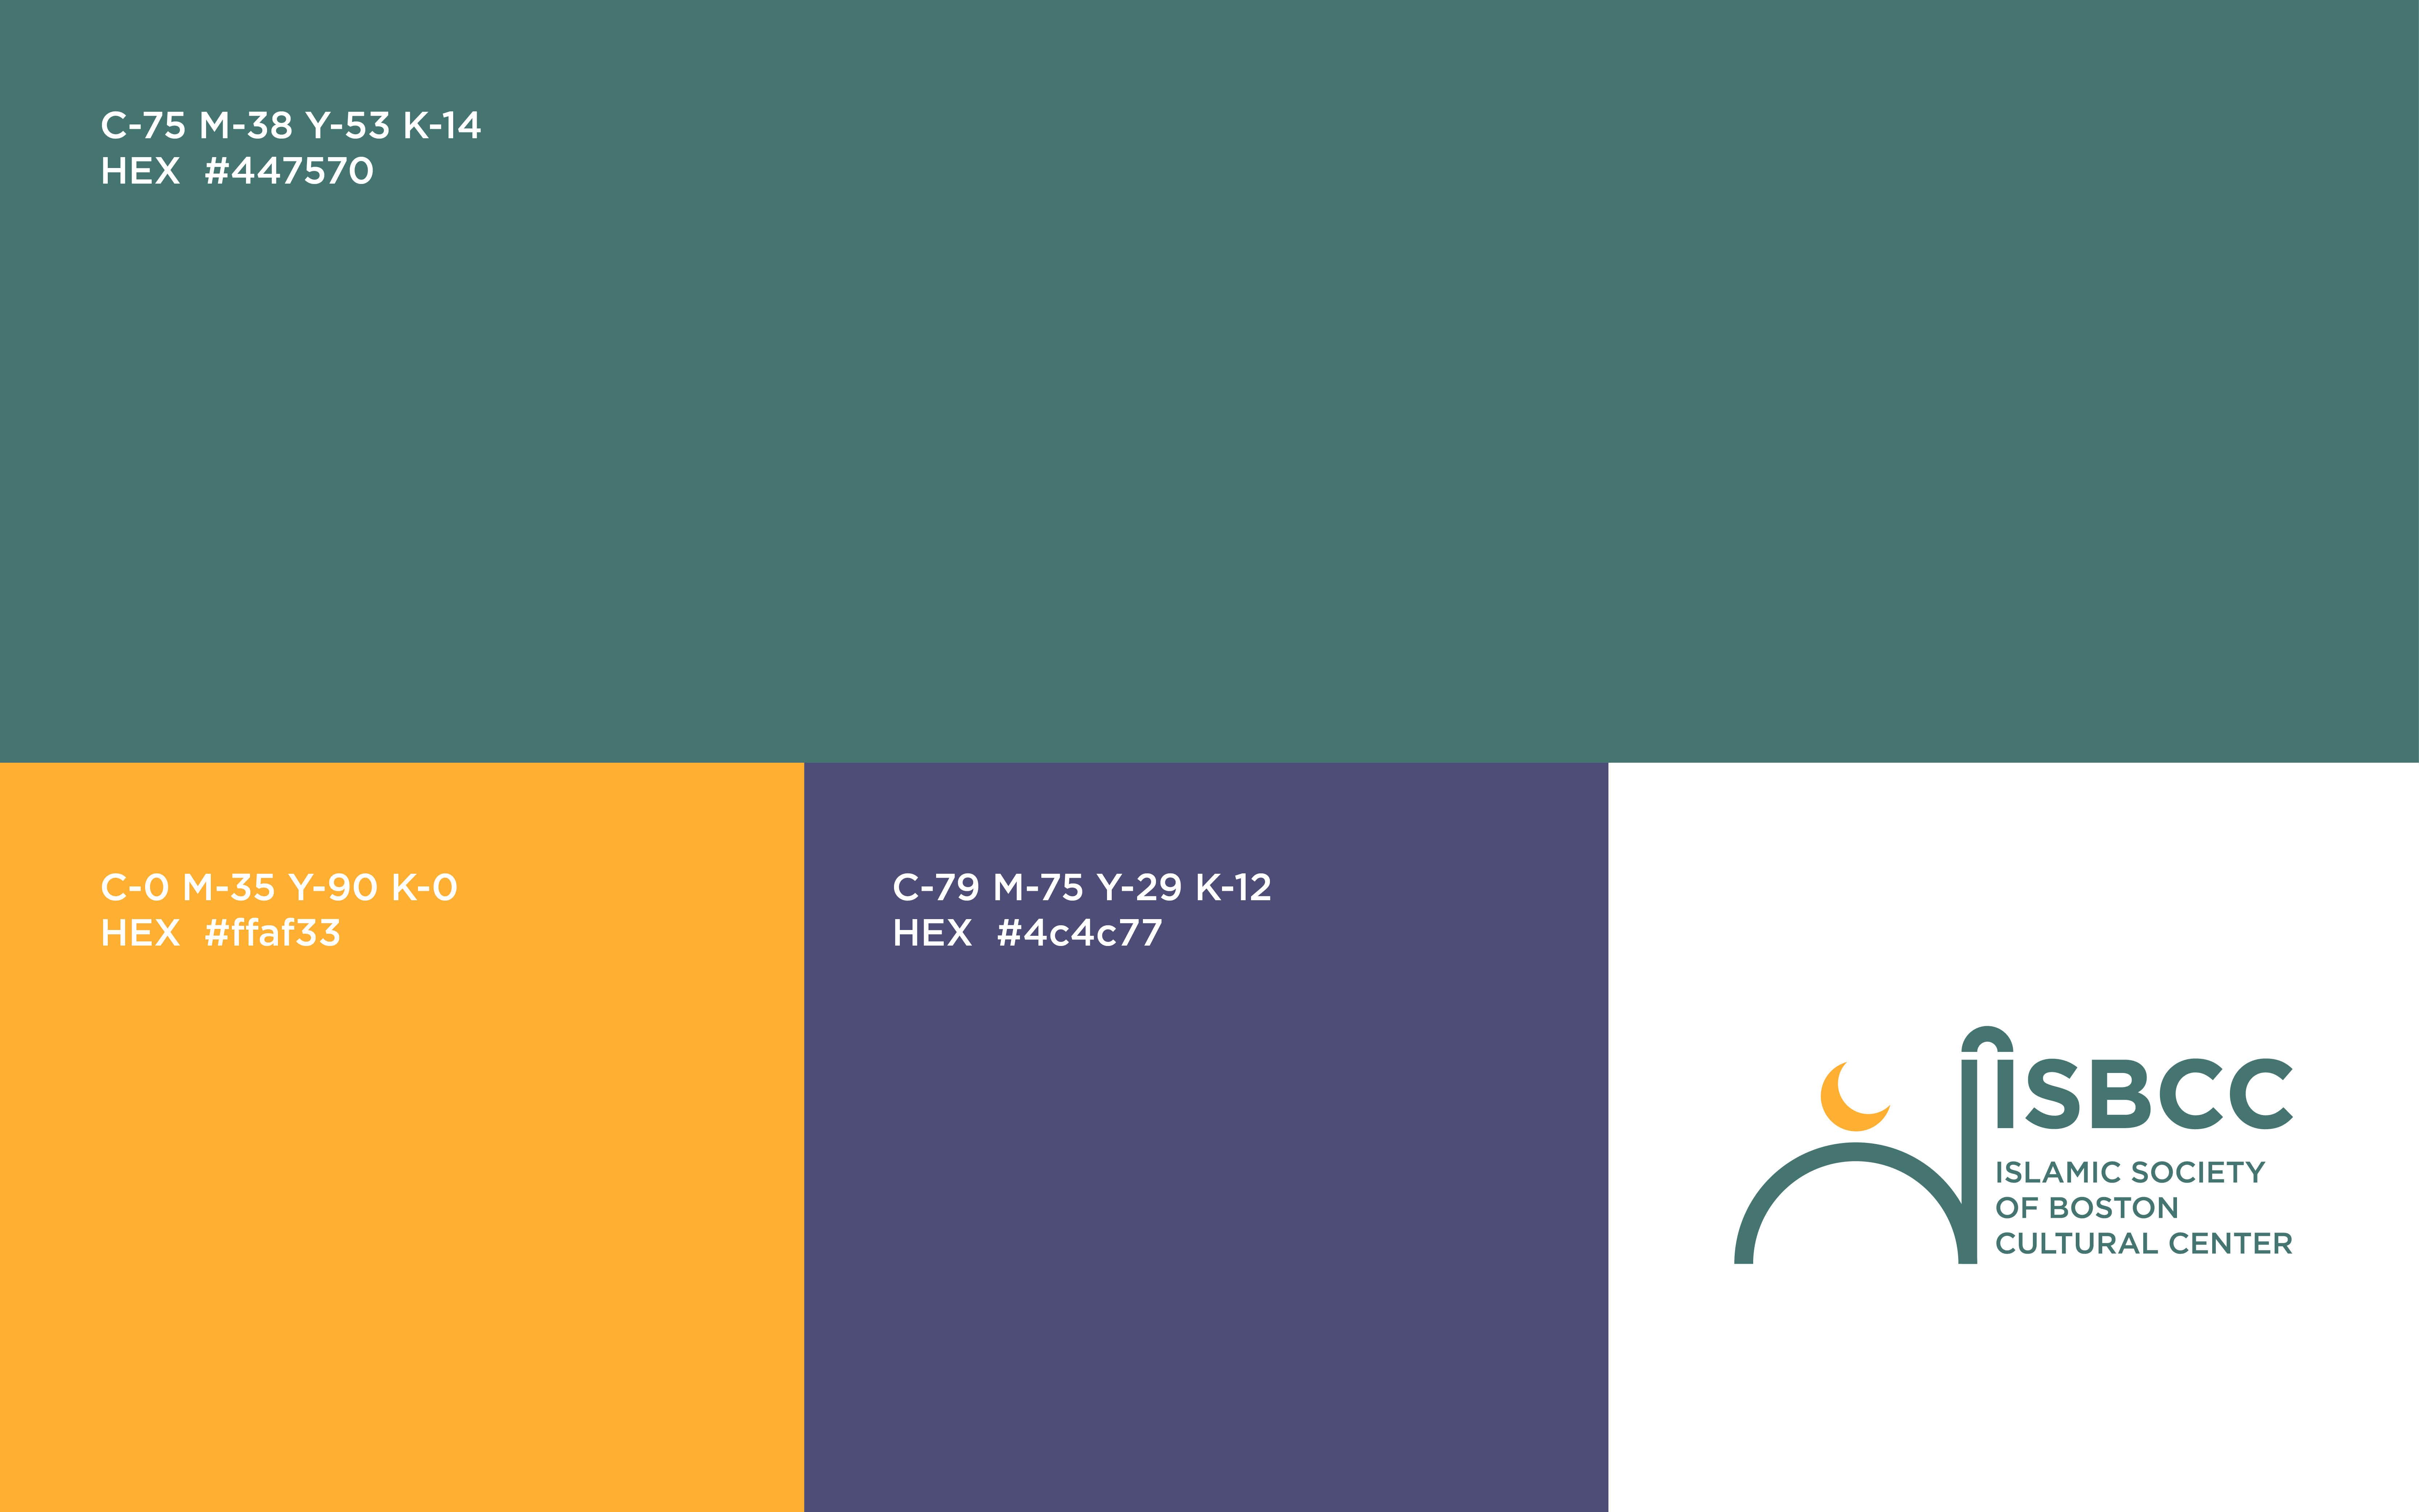 ISBCC_Branding3